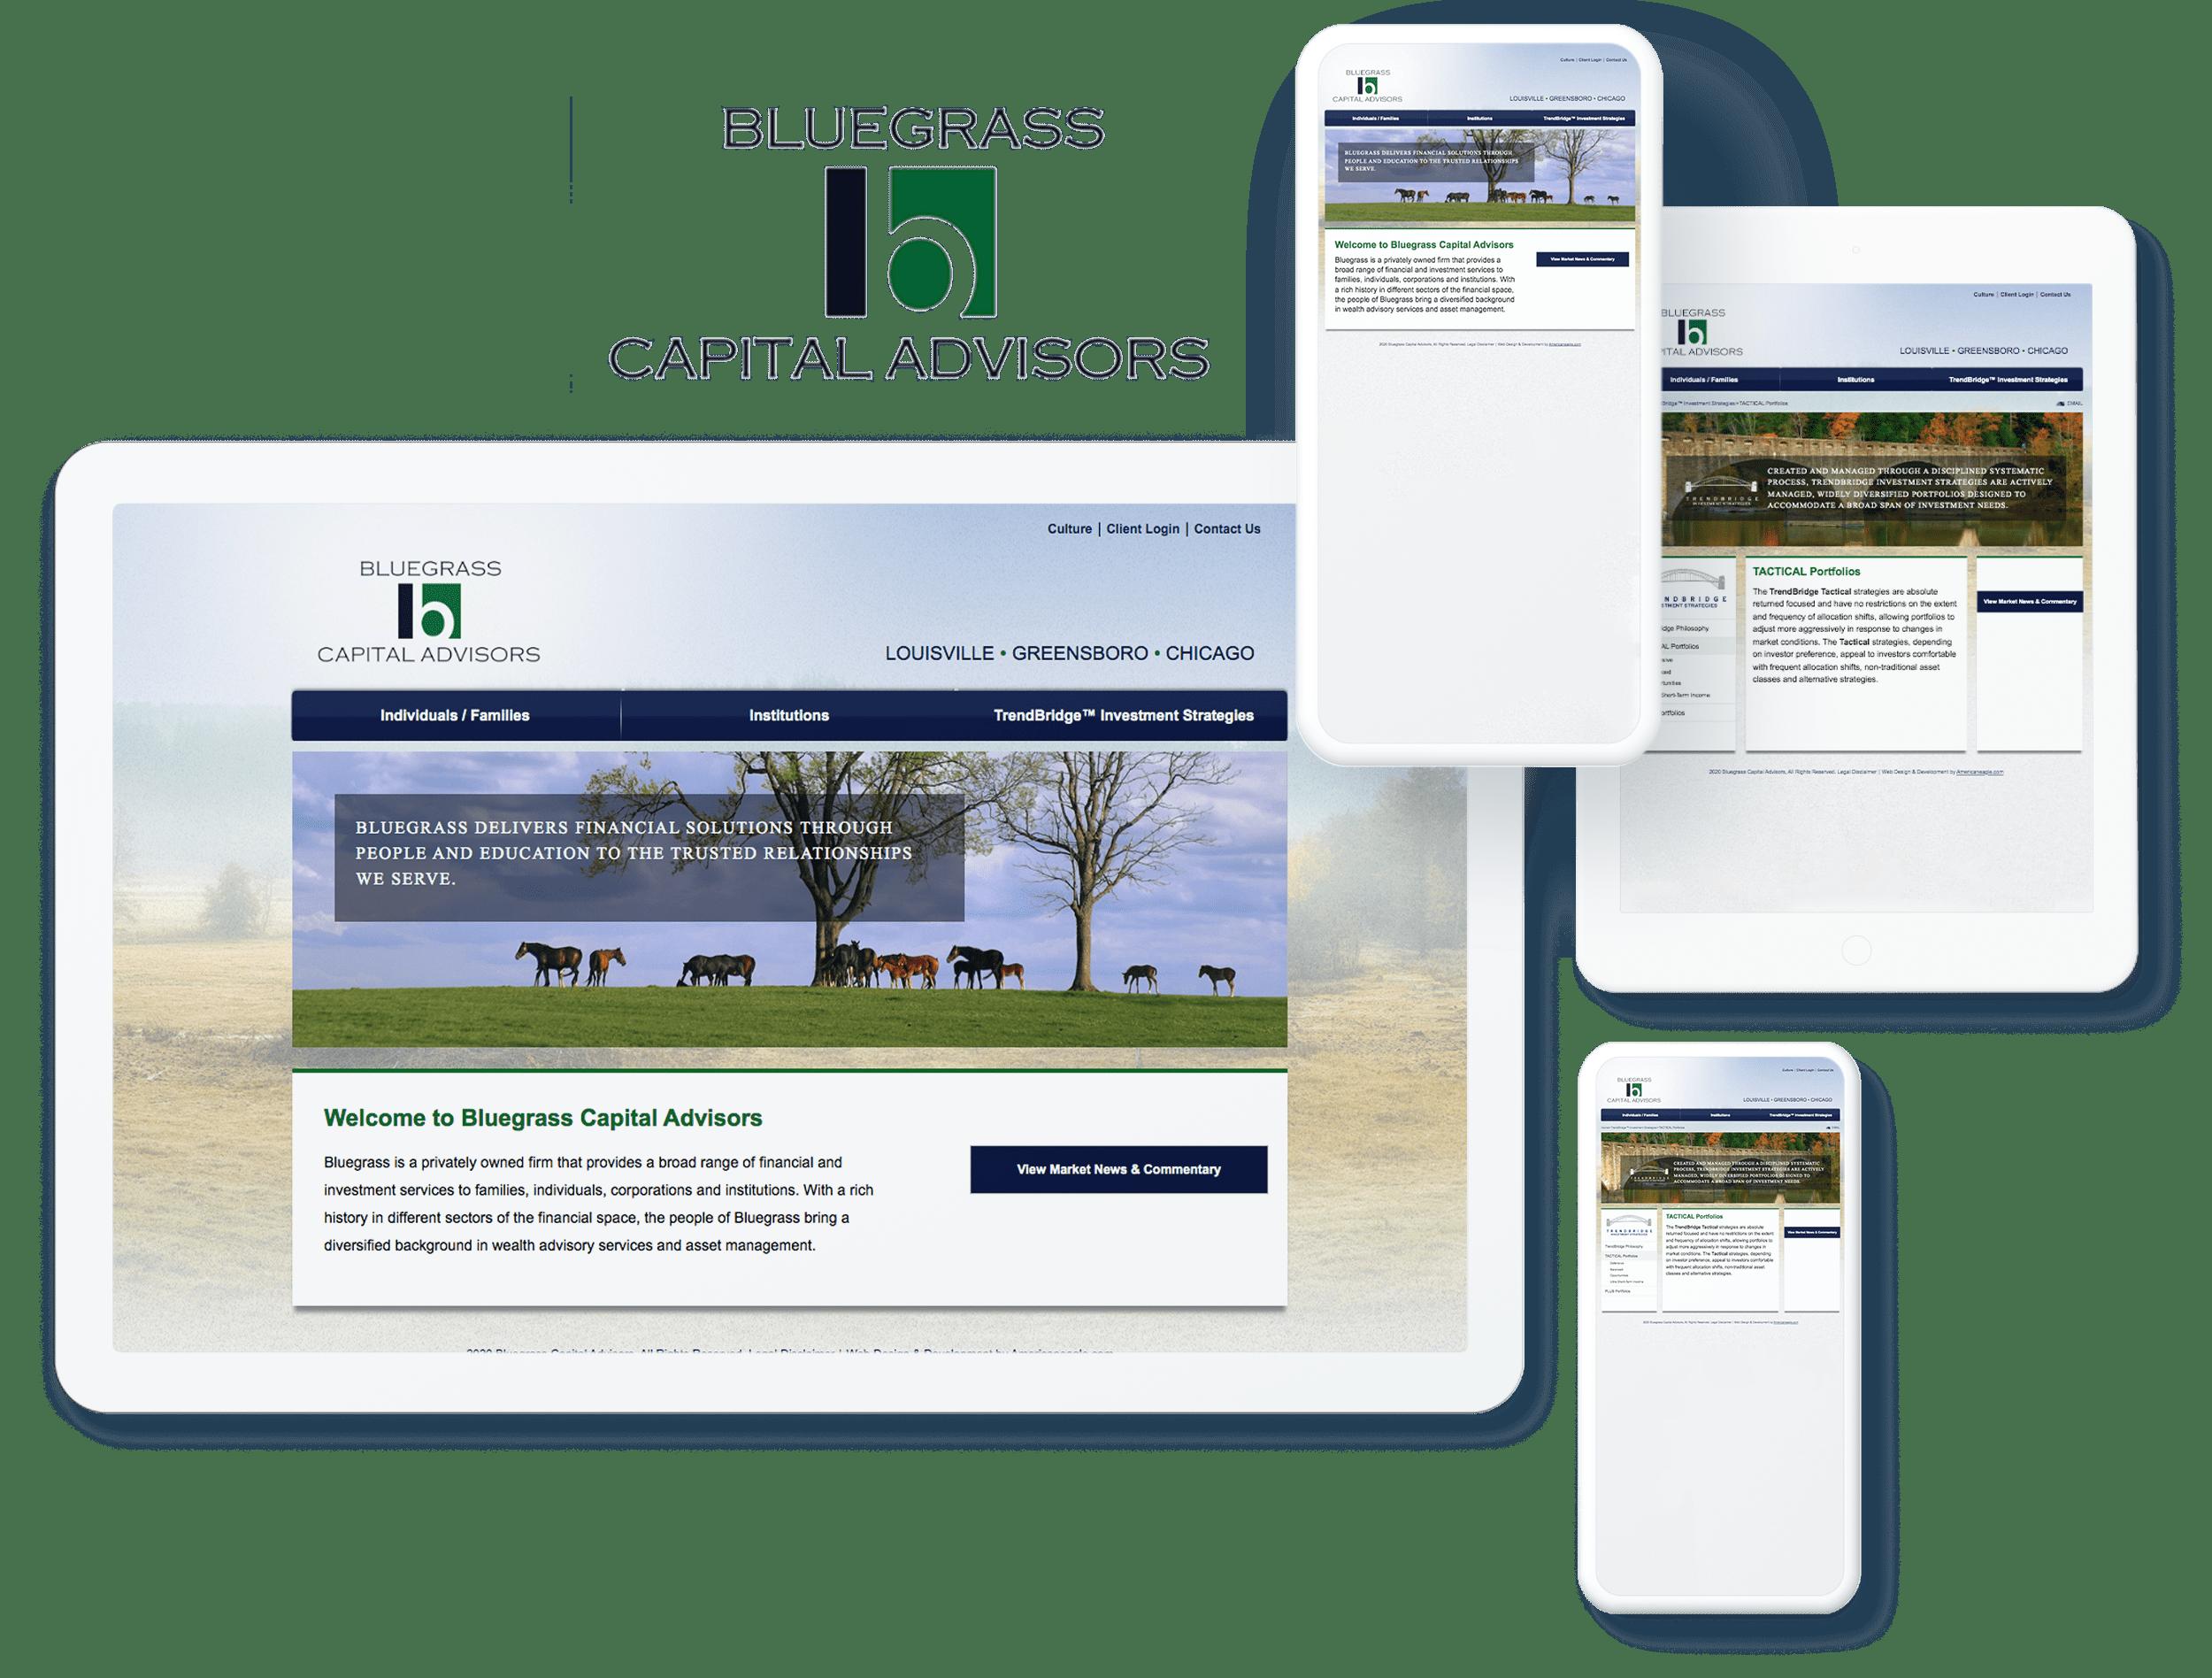 Bluegrass Capital Advisors